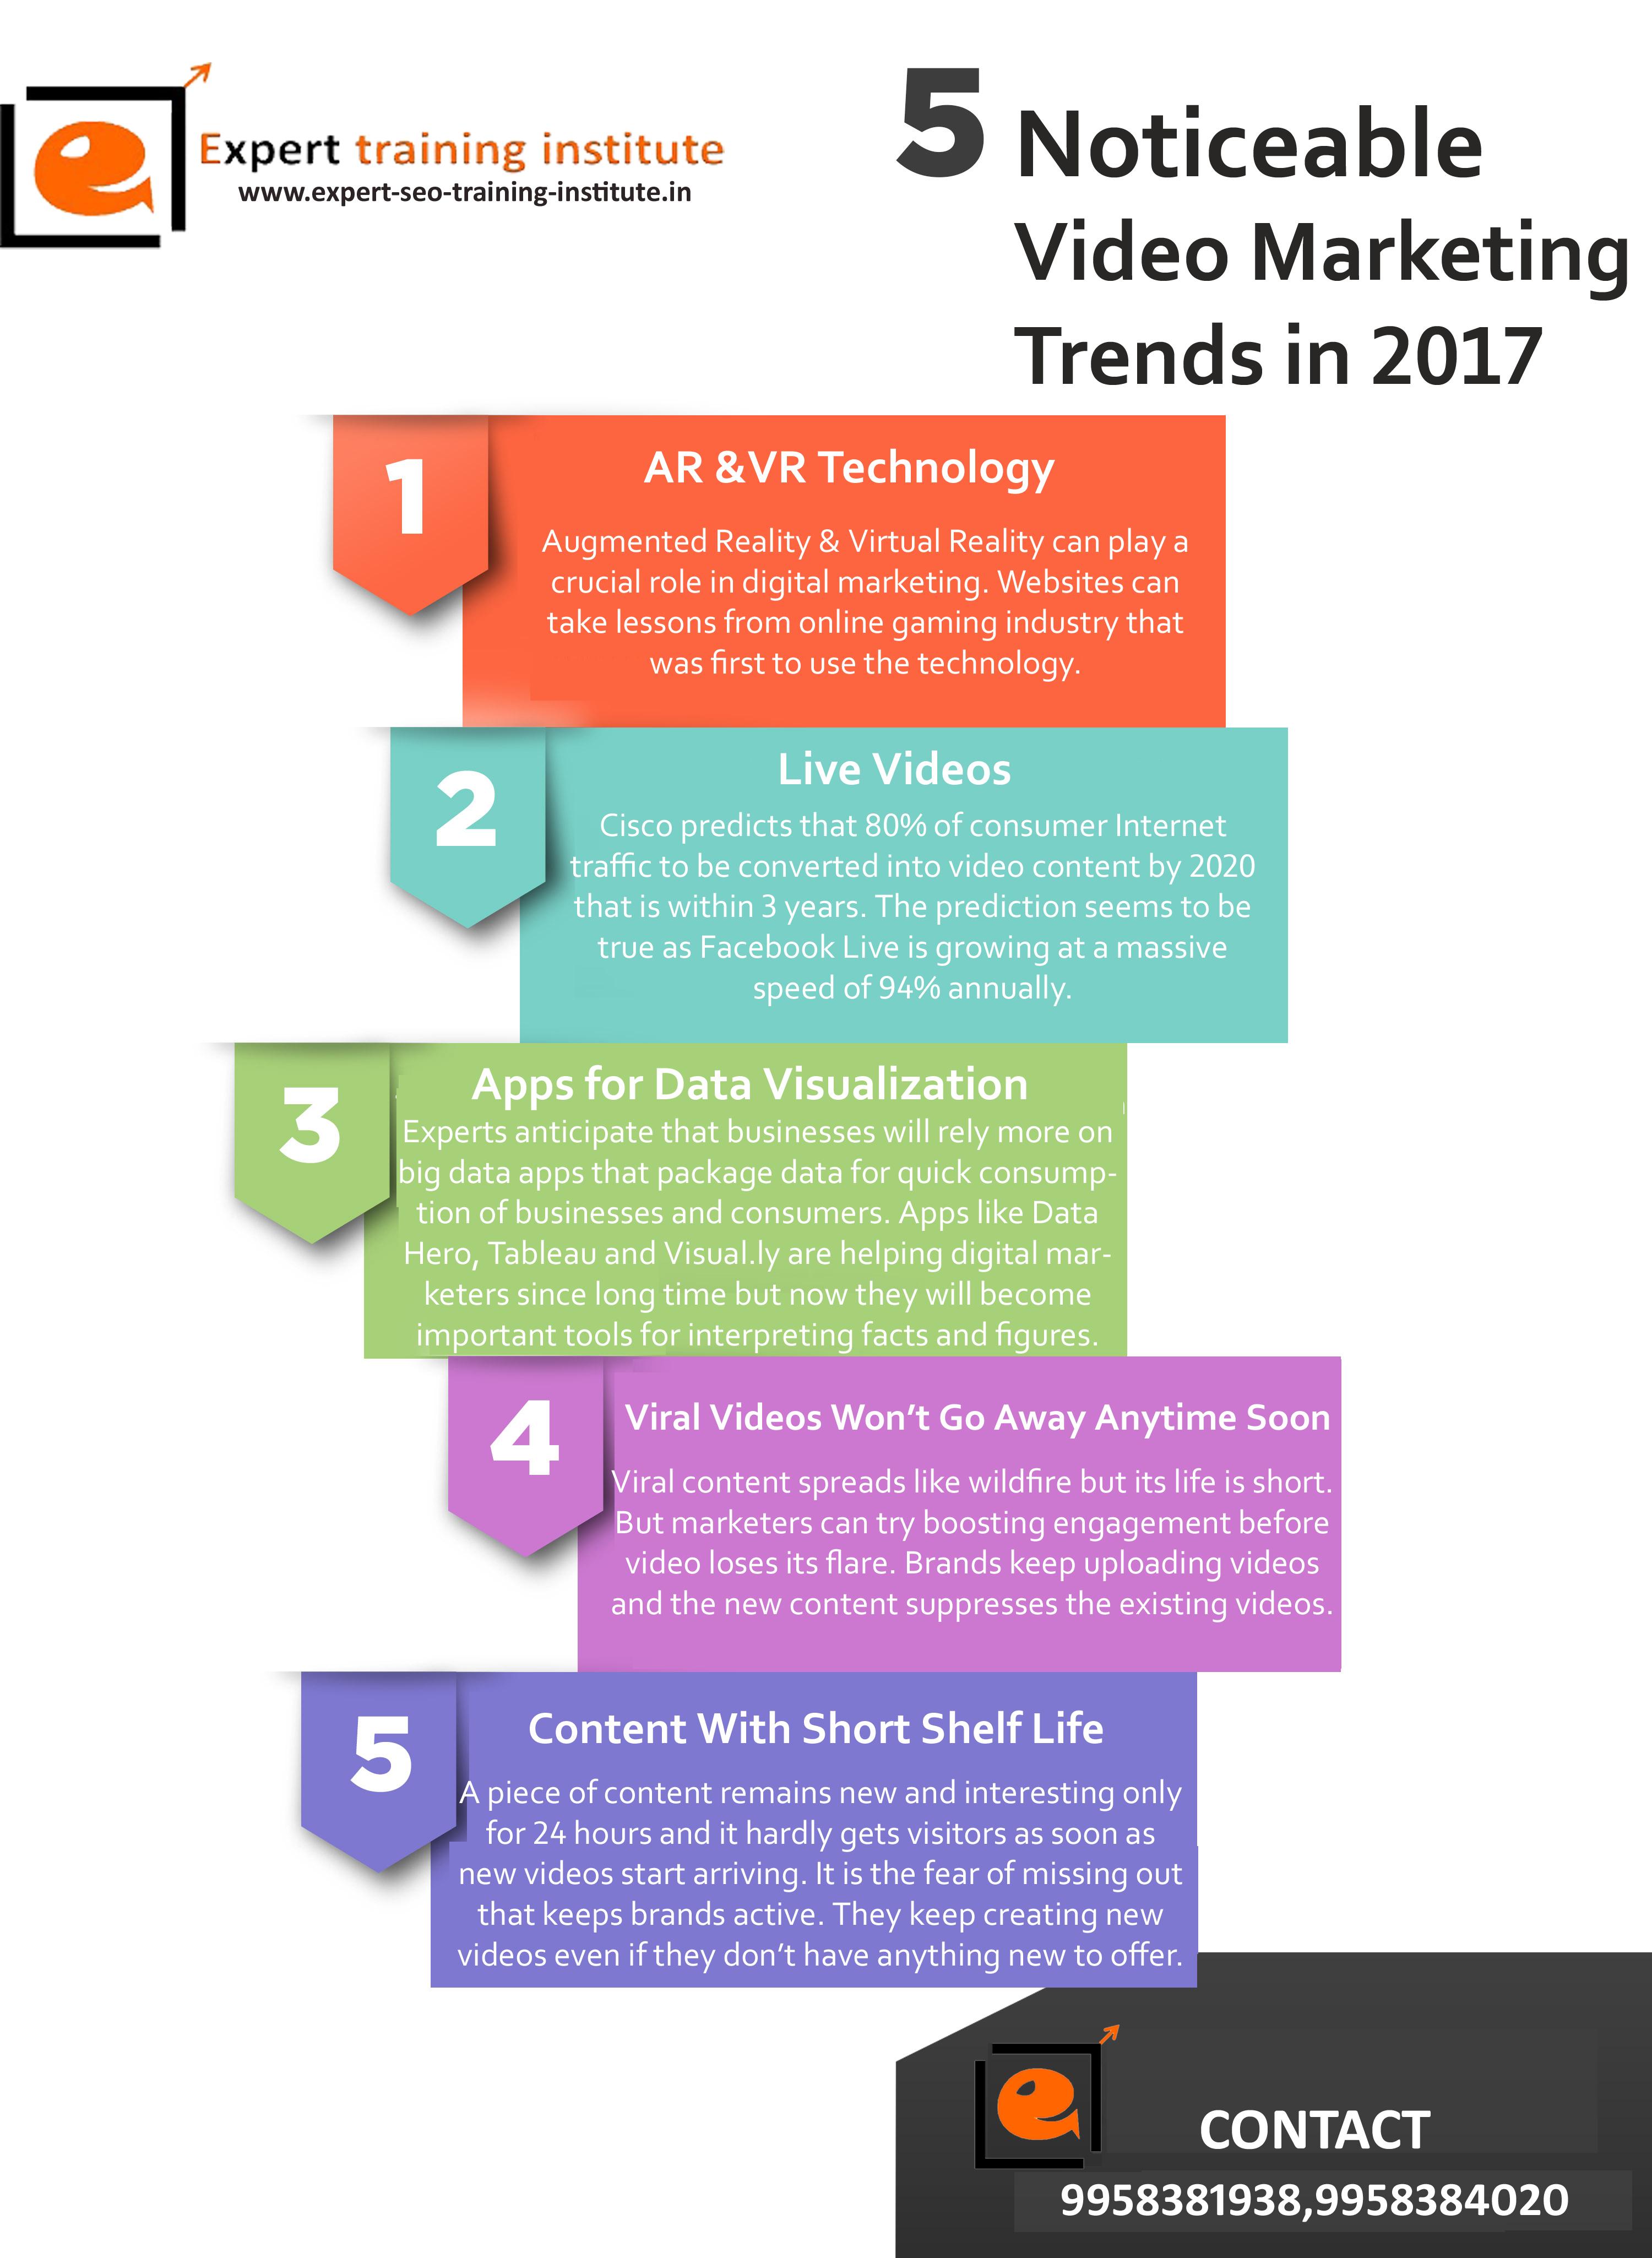 5 Noticeable Video Marketing Trends in 2017